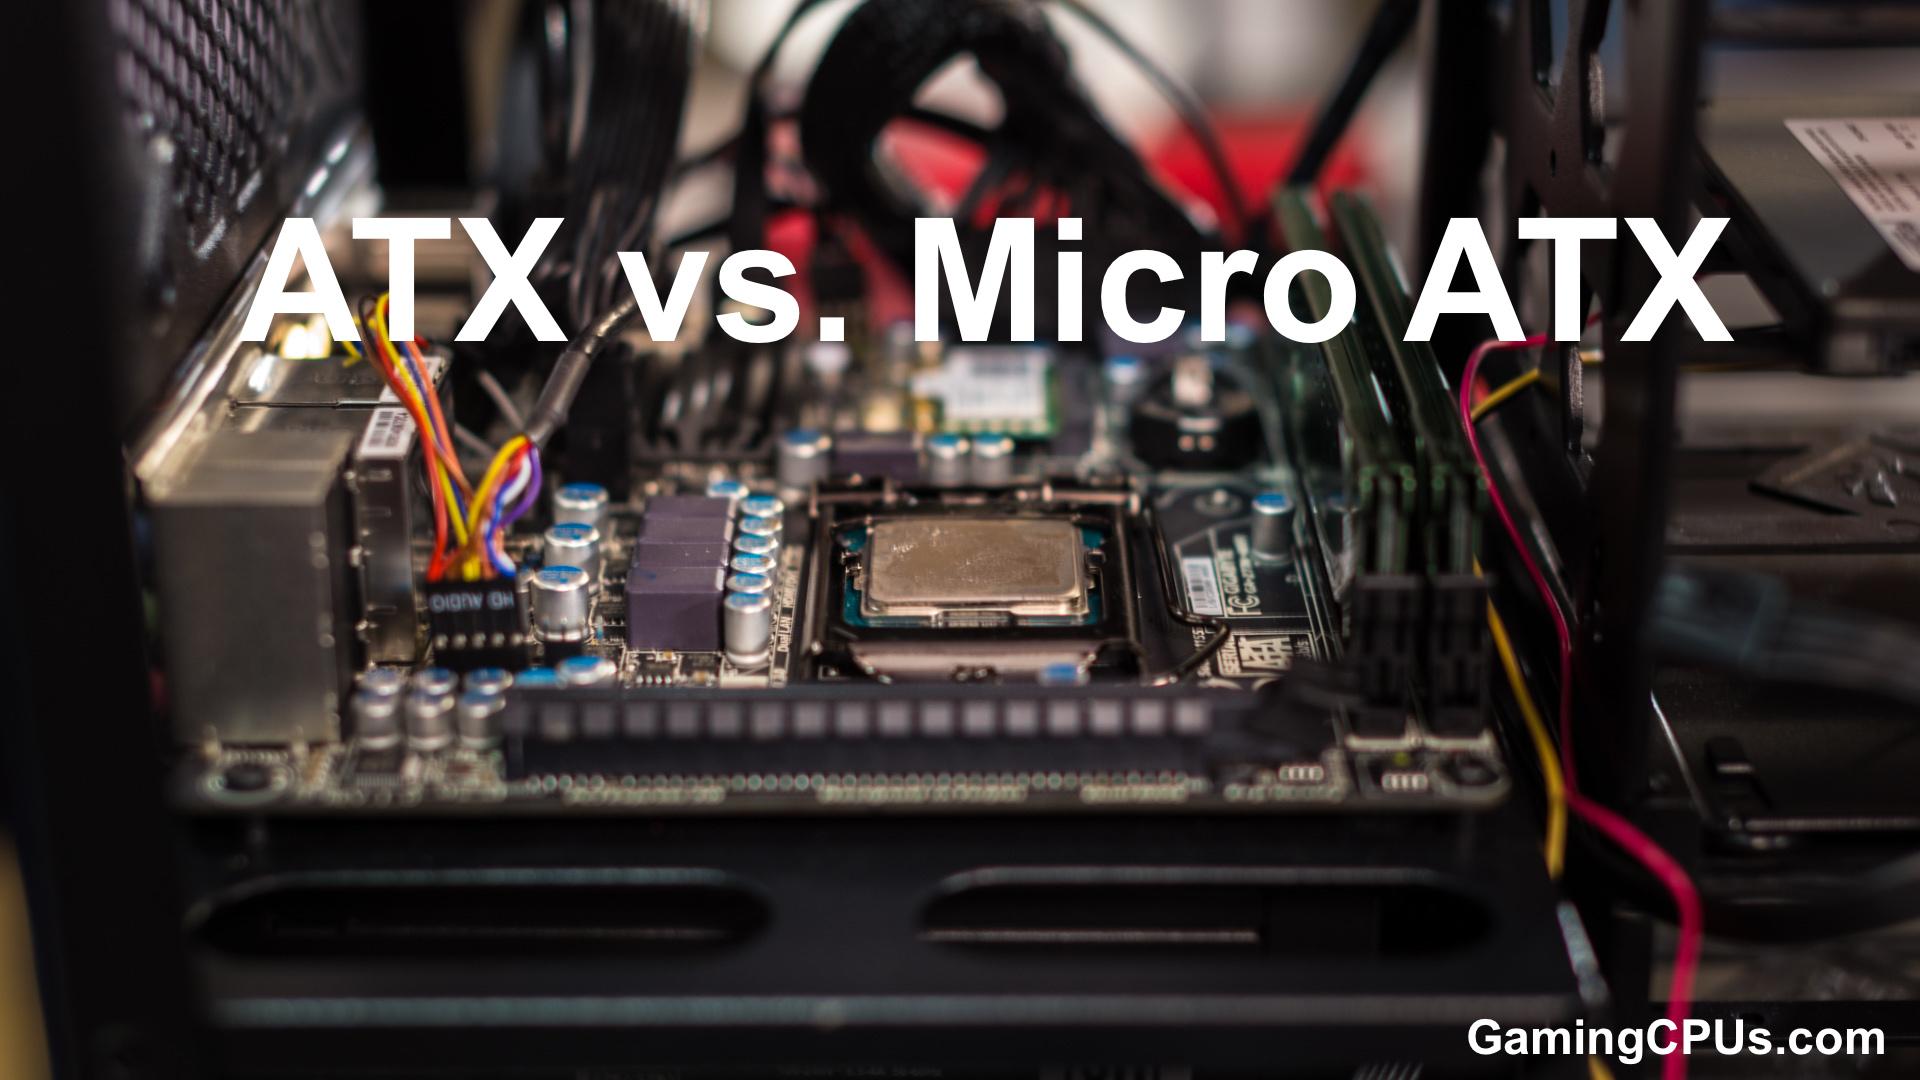 atx vs micro atx gaming